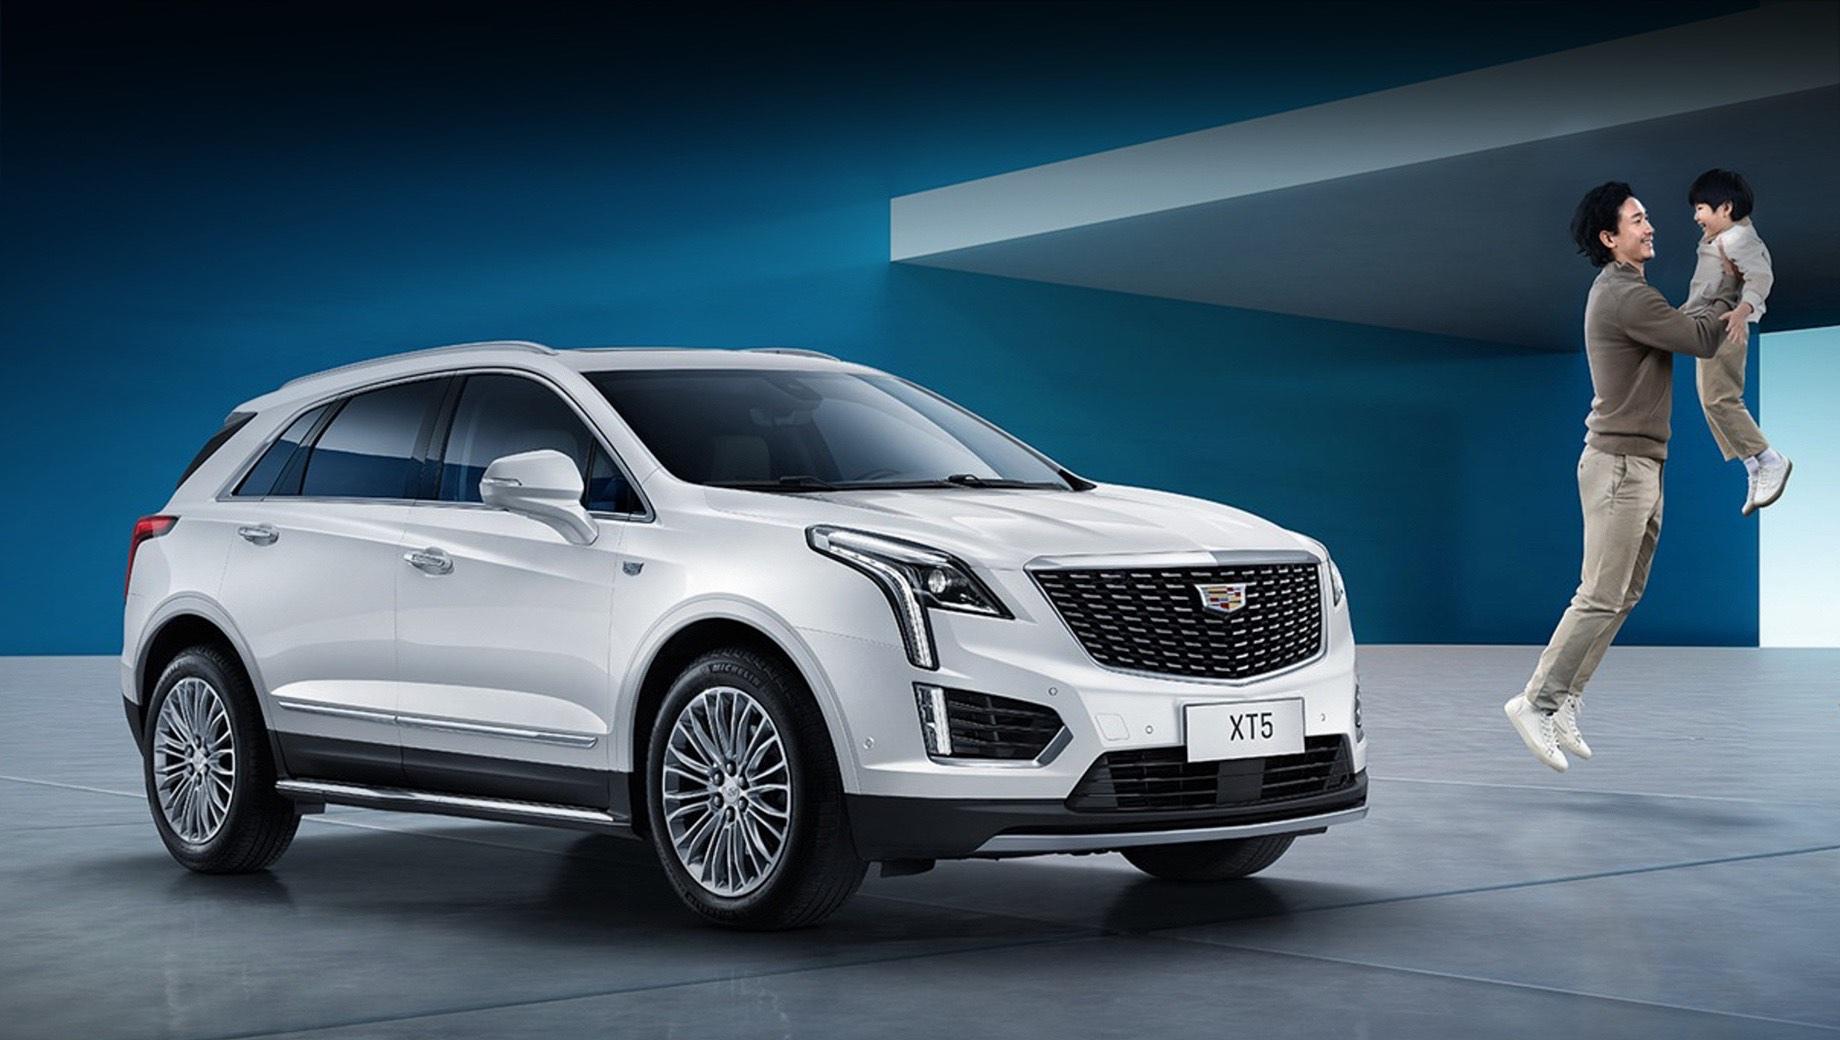 В Китае начались продажи гибридов Cadillac XT5 и XT6